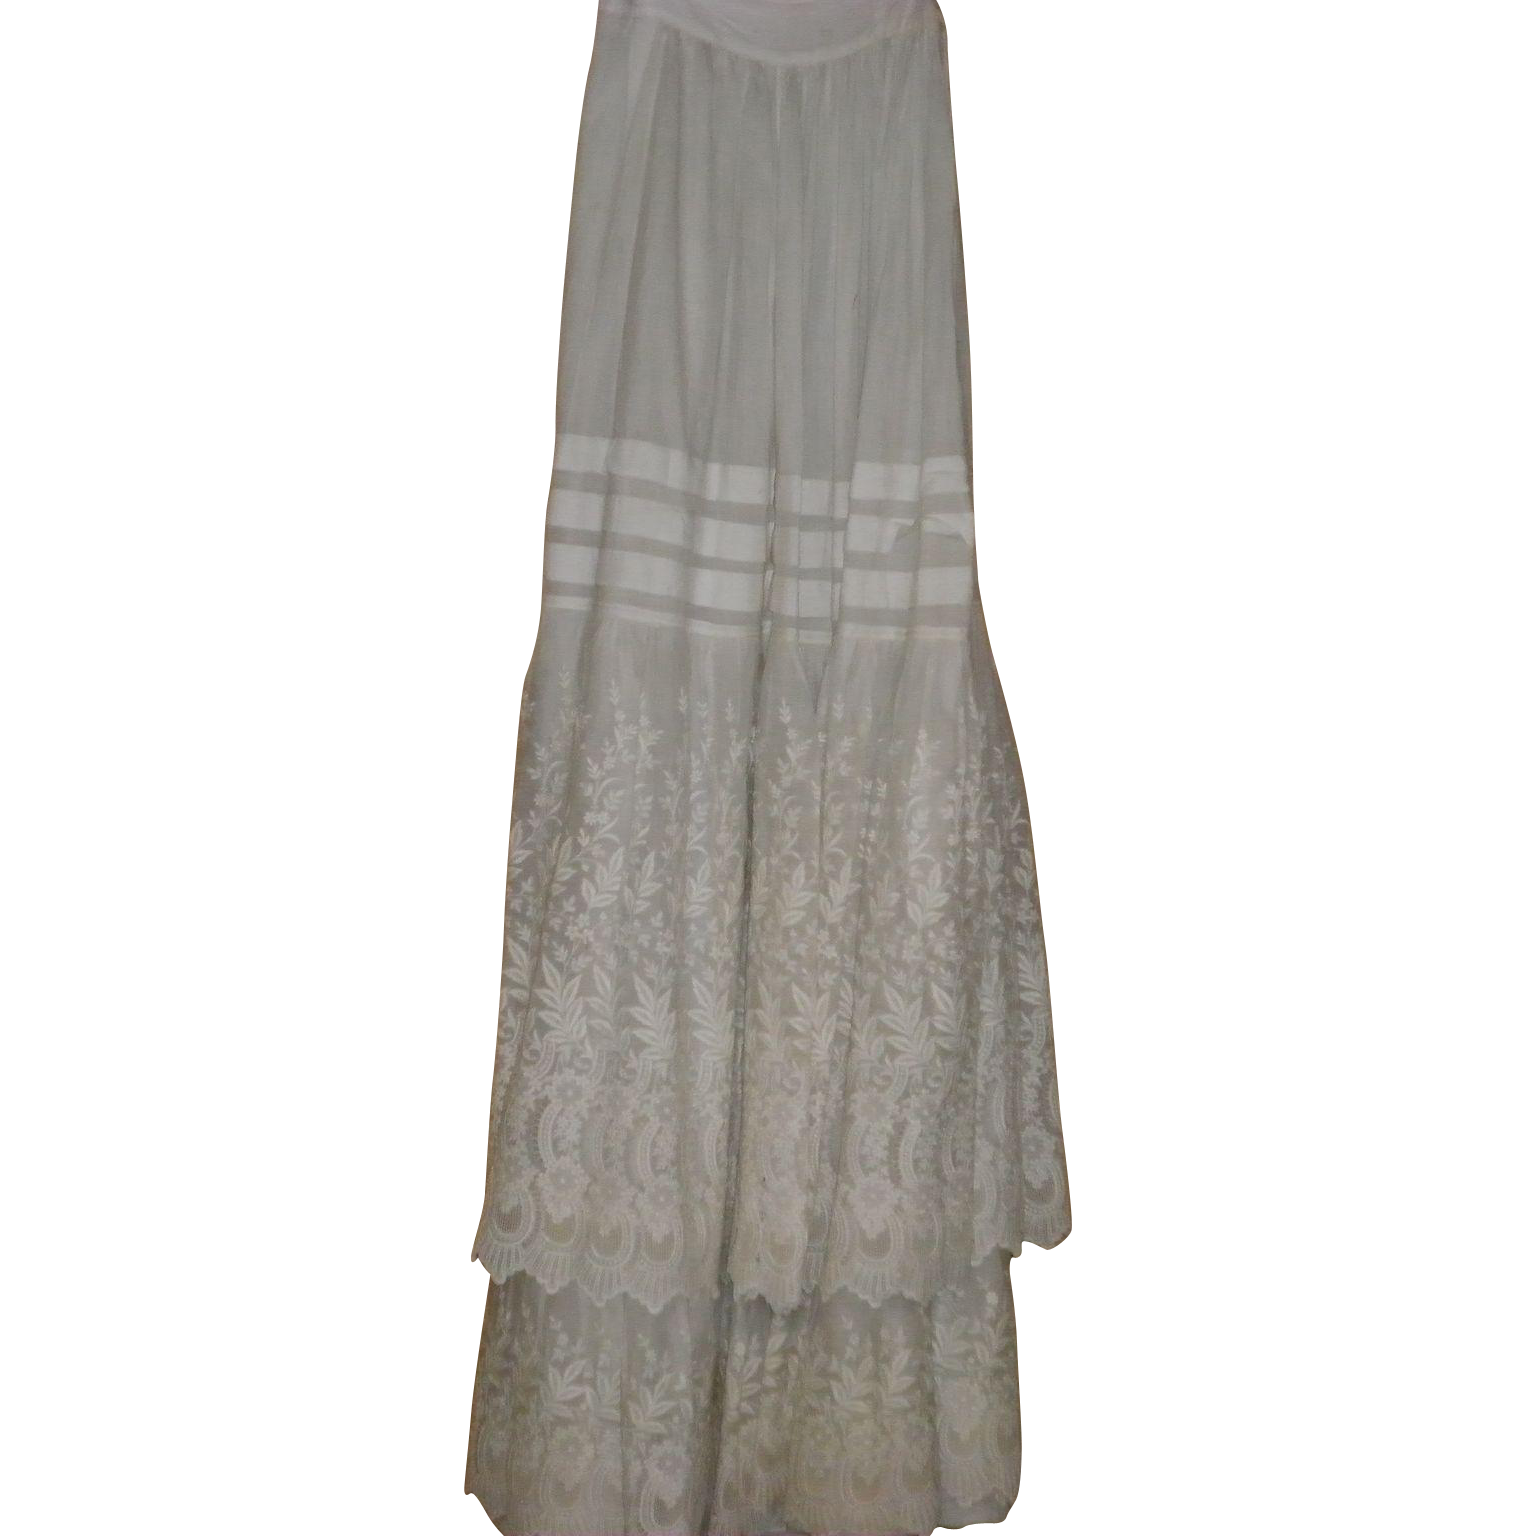 Victorian lace Skirt / Petticoat / Slip